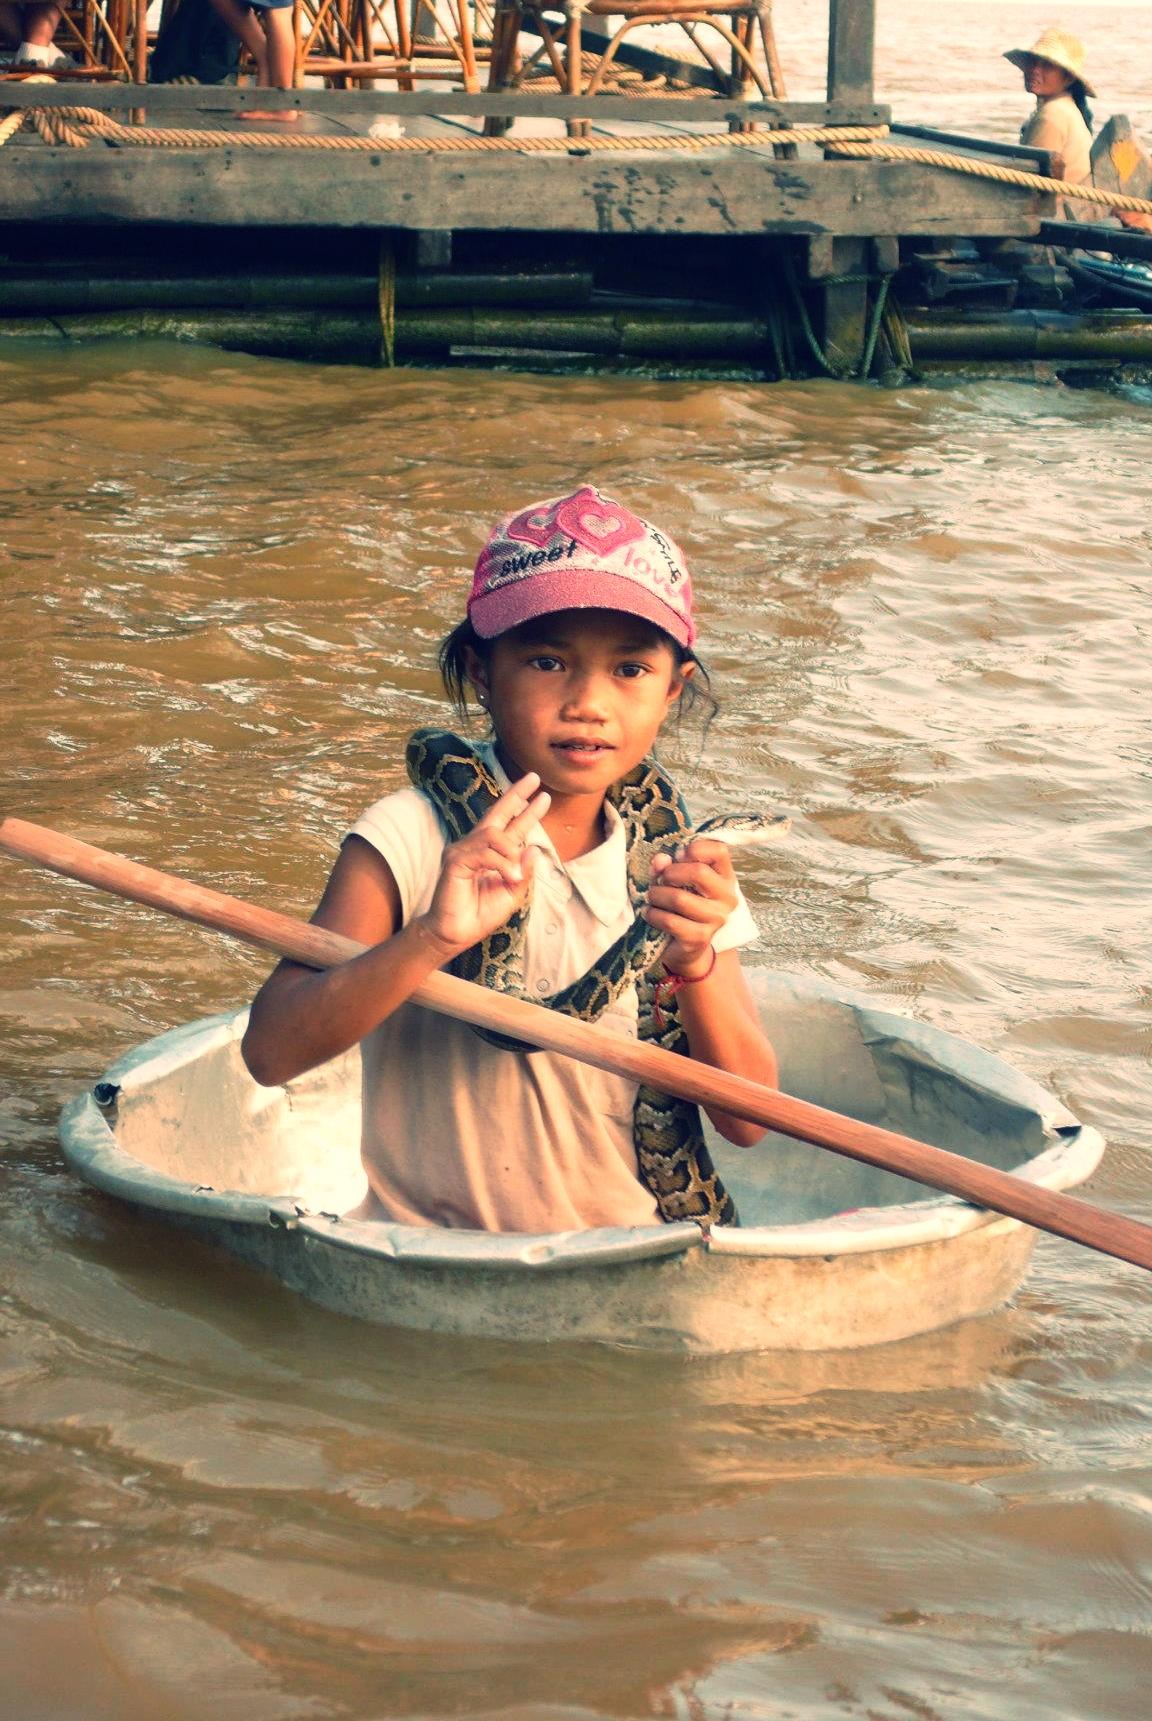 cambodia travel guide budget